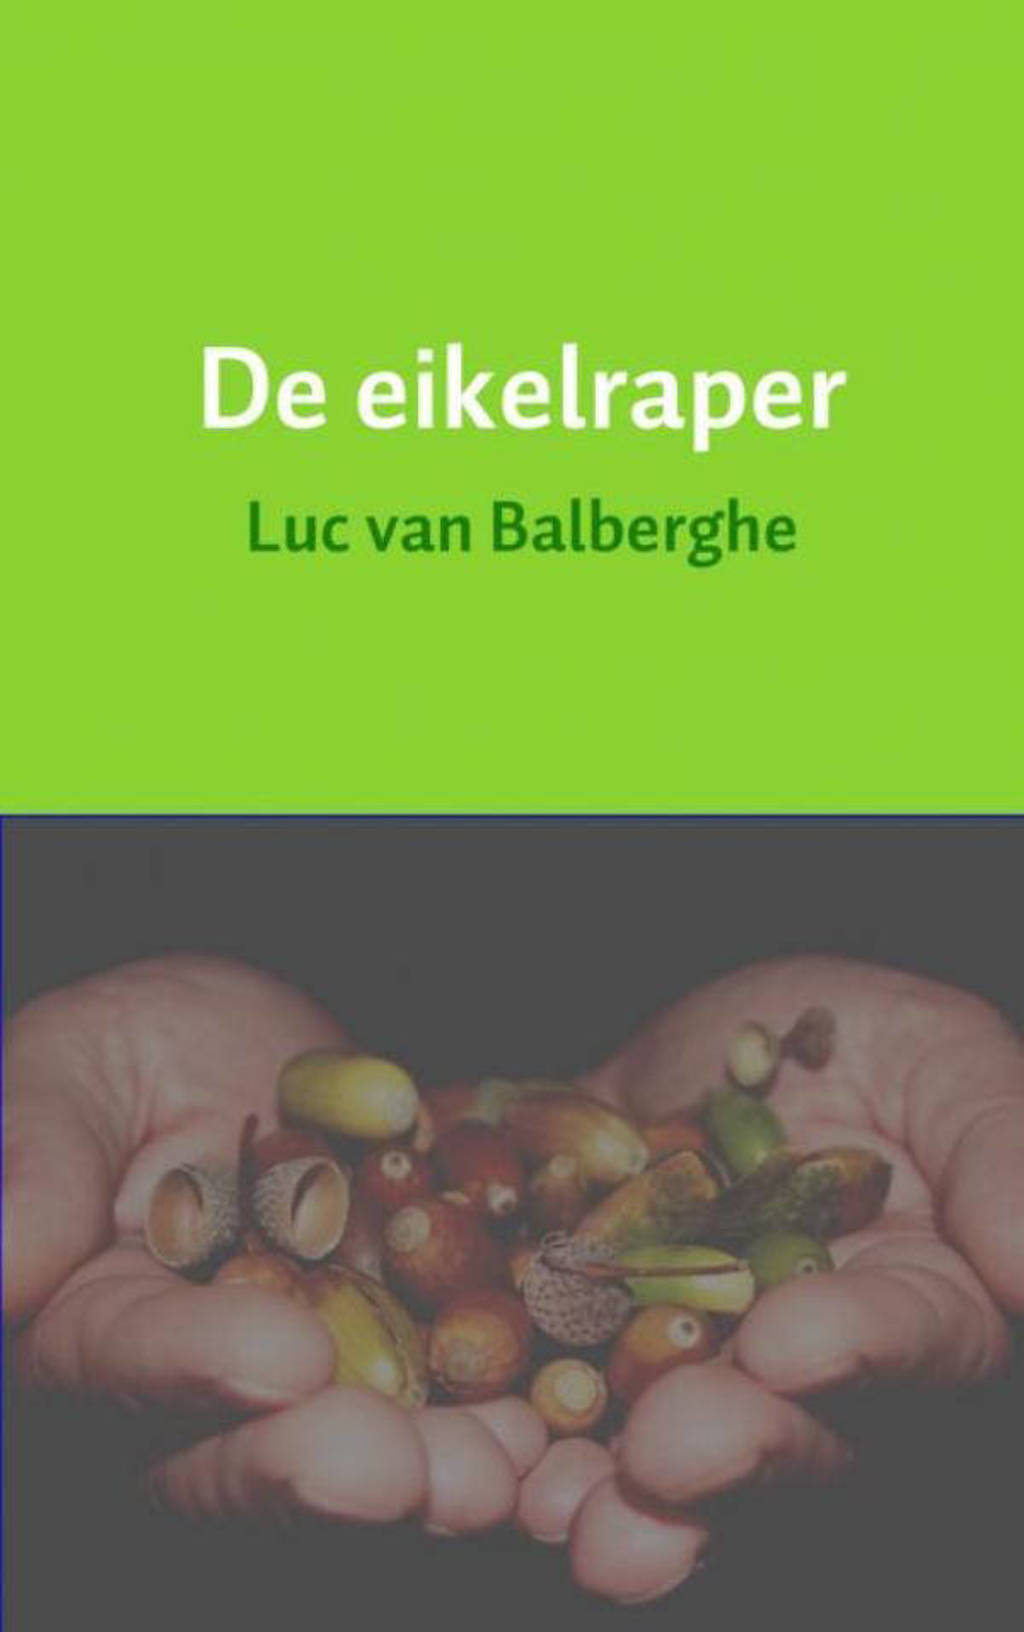 De eikelraper - Luc van Balberghe